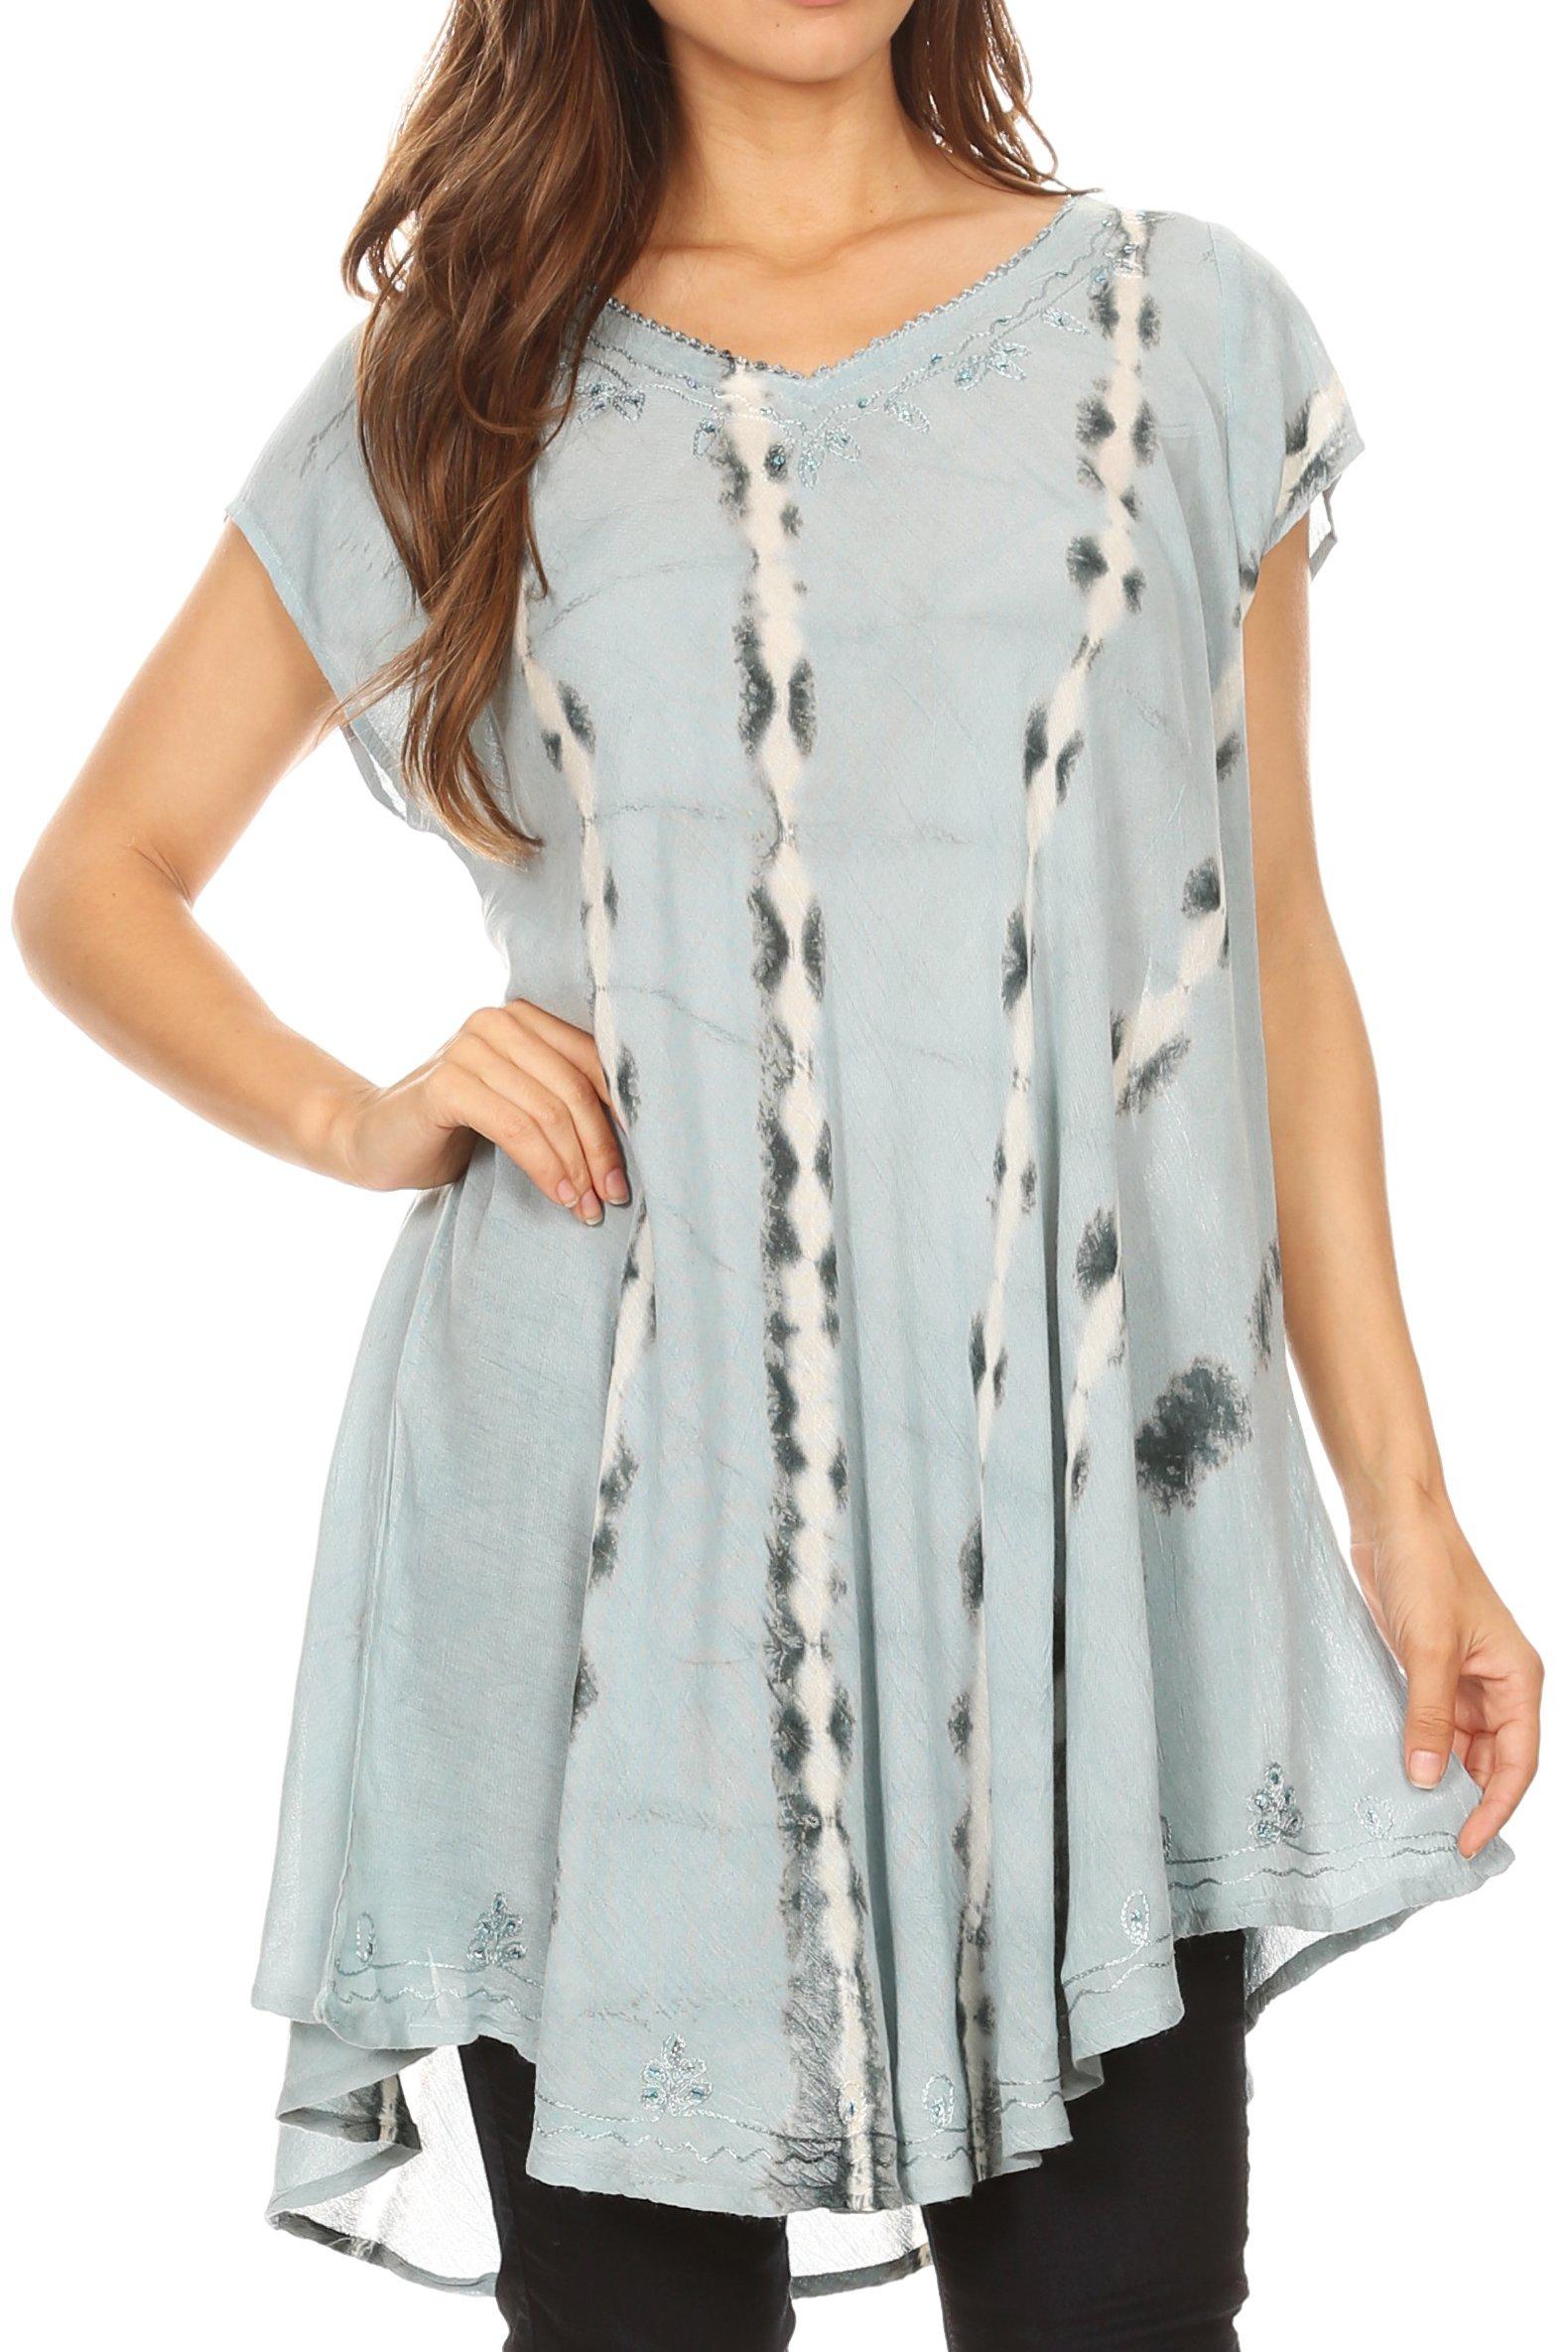 Sakkas 18702 - Maite Womens Tie Dye V Neck Tunic Top Ethnic Summer Style Flowy w/Sequin - Dusty Blue - OSP